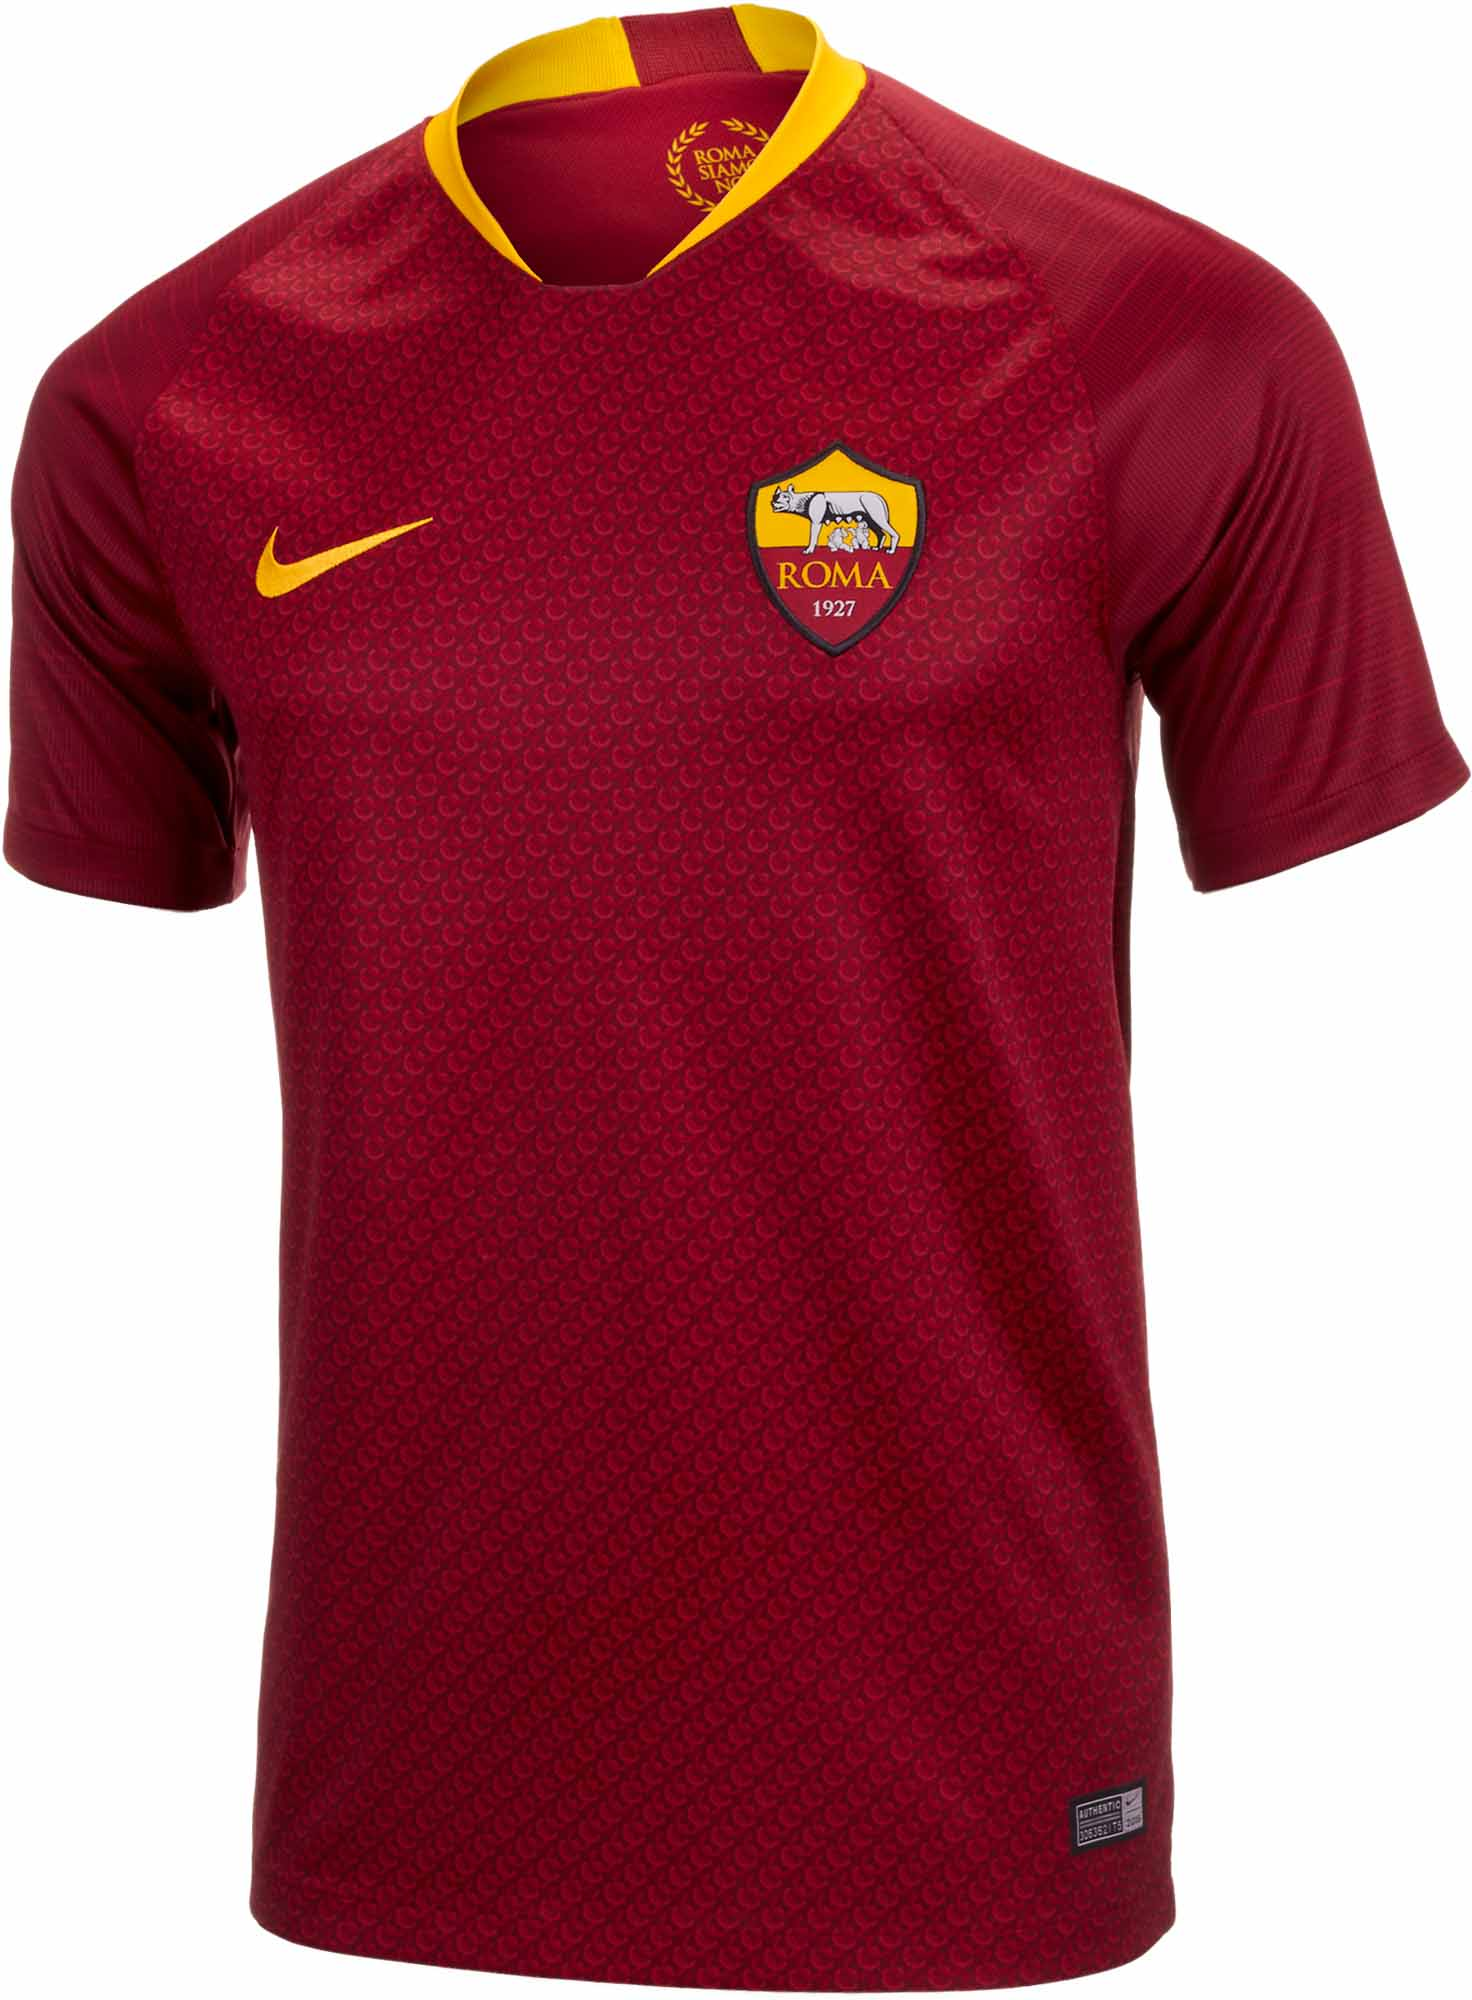 Nike Roma Home Jersey 2018-19 - SoccerPro